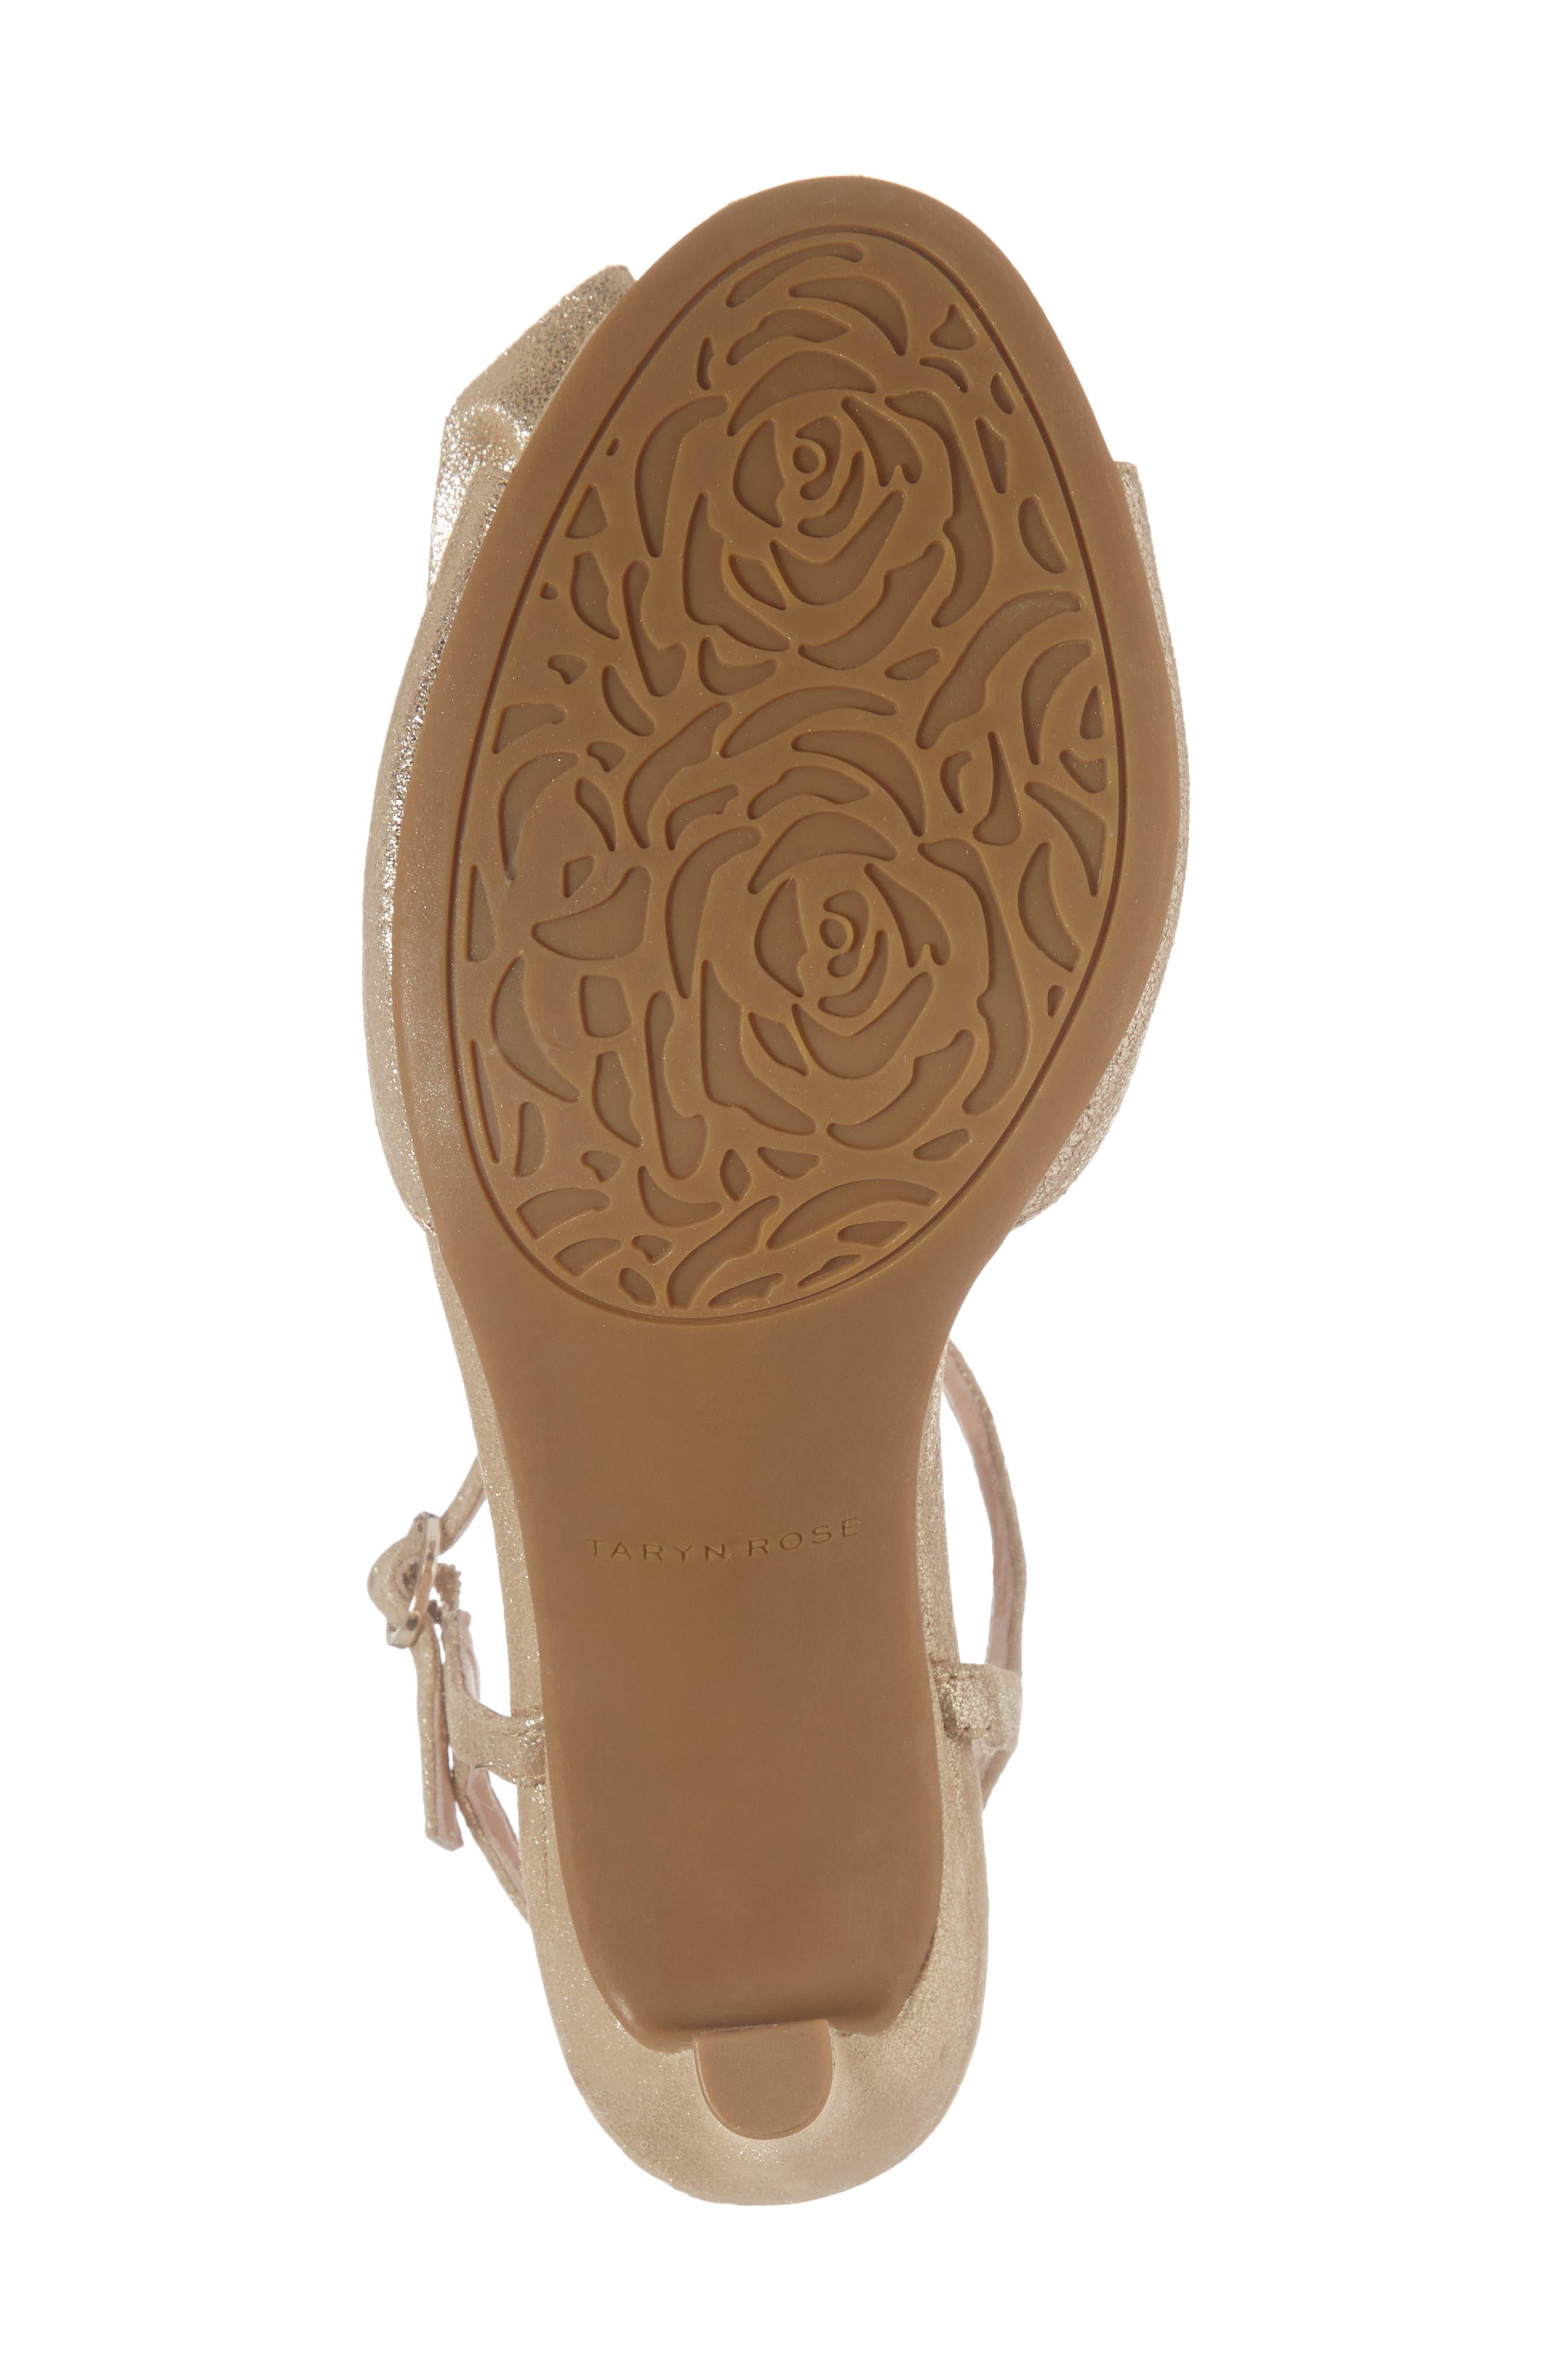 Jacklyn Flower Sandal,                             Alternate thumbnail 6, color,                             Gold Shimmer Fabric